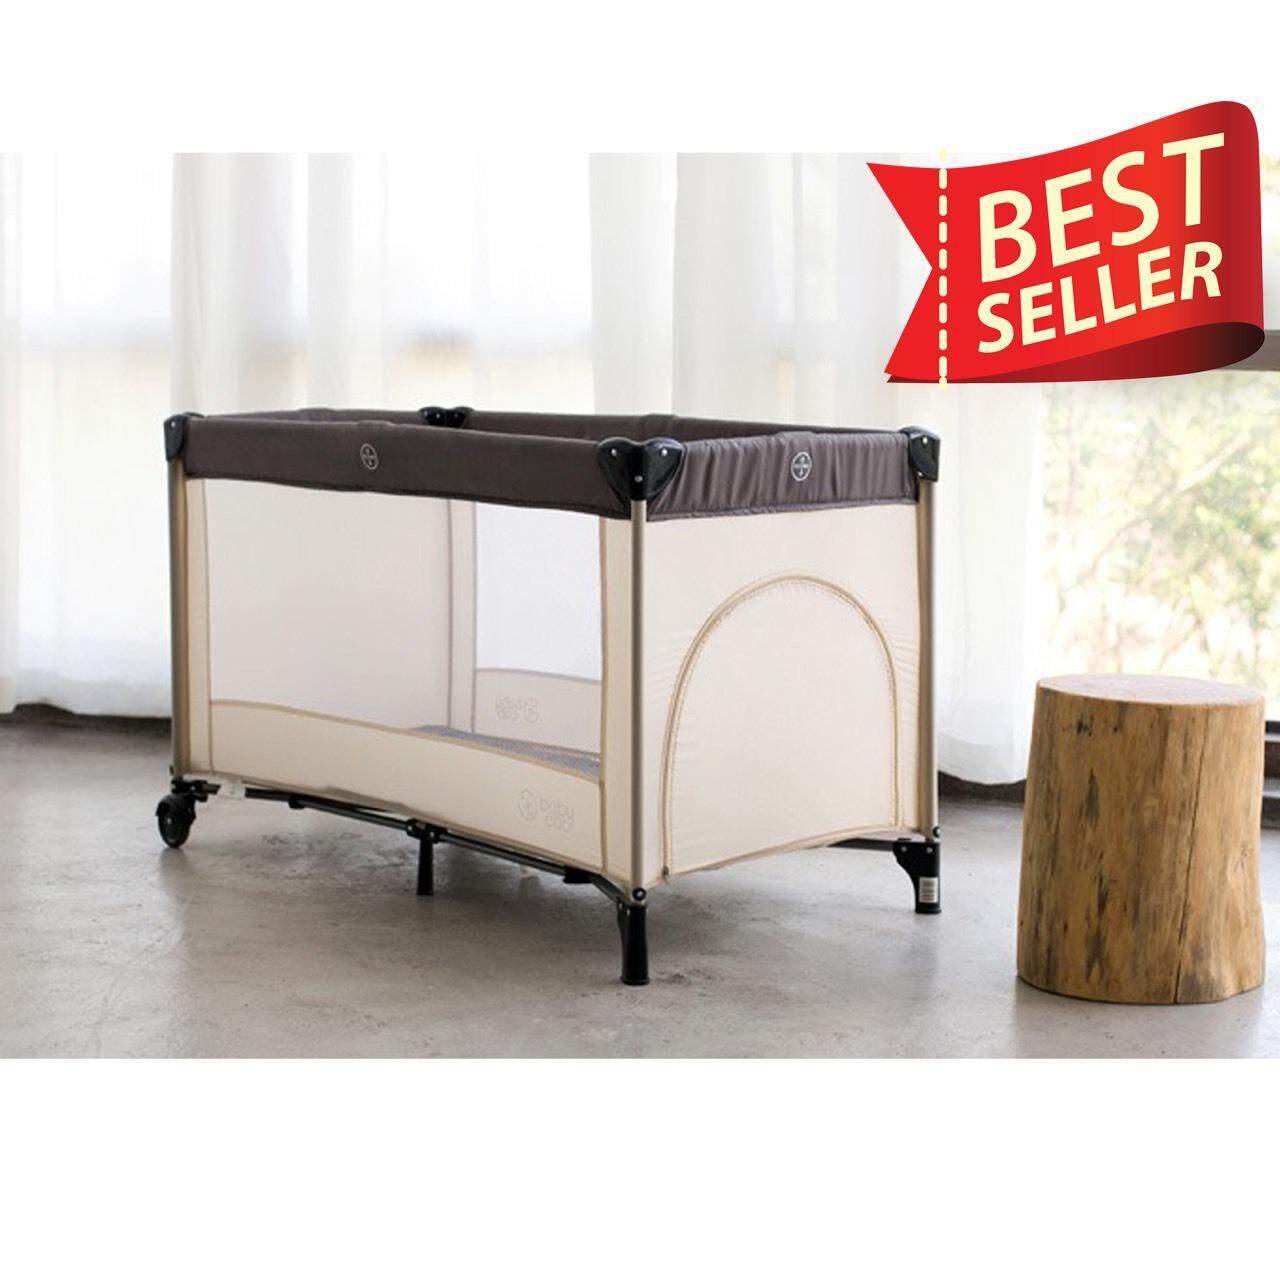 Hot Item Baby Bed ที่นอนเด็กแบบพับได้ 0-5 ขวบ 125x65x76(cm)(สีครีม).